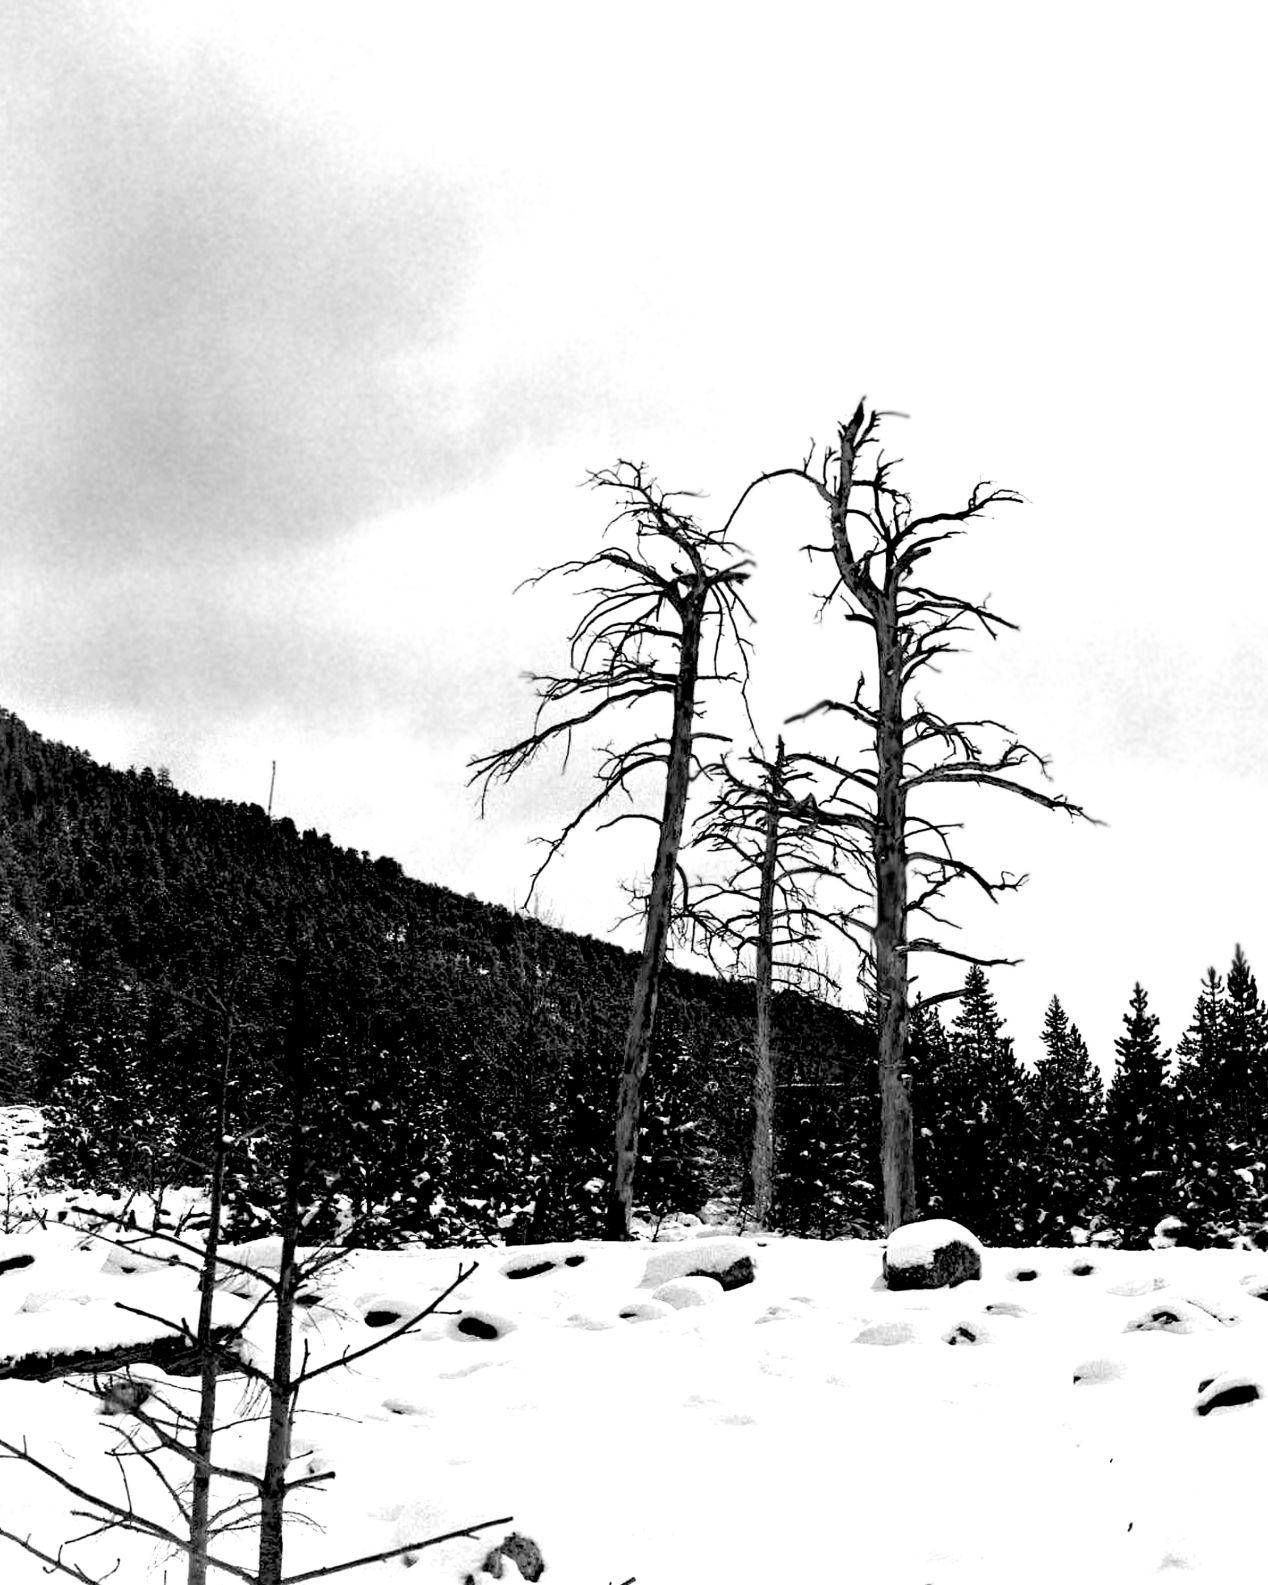 Rocky Mountain National Park, Alluvial fan. 4x5